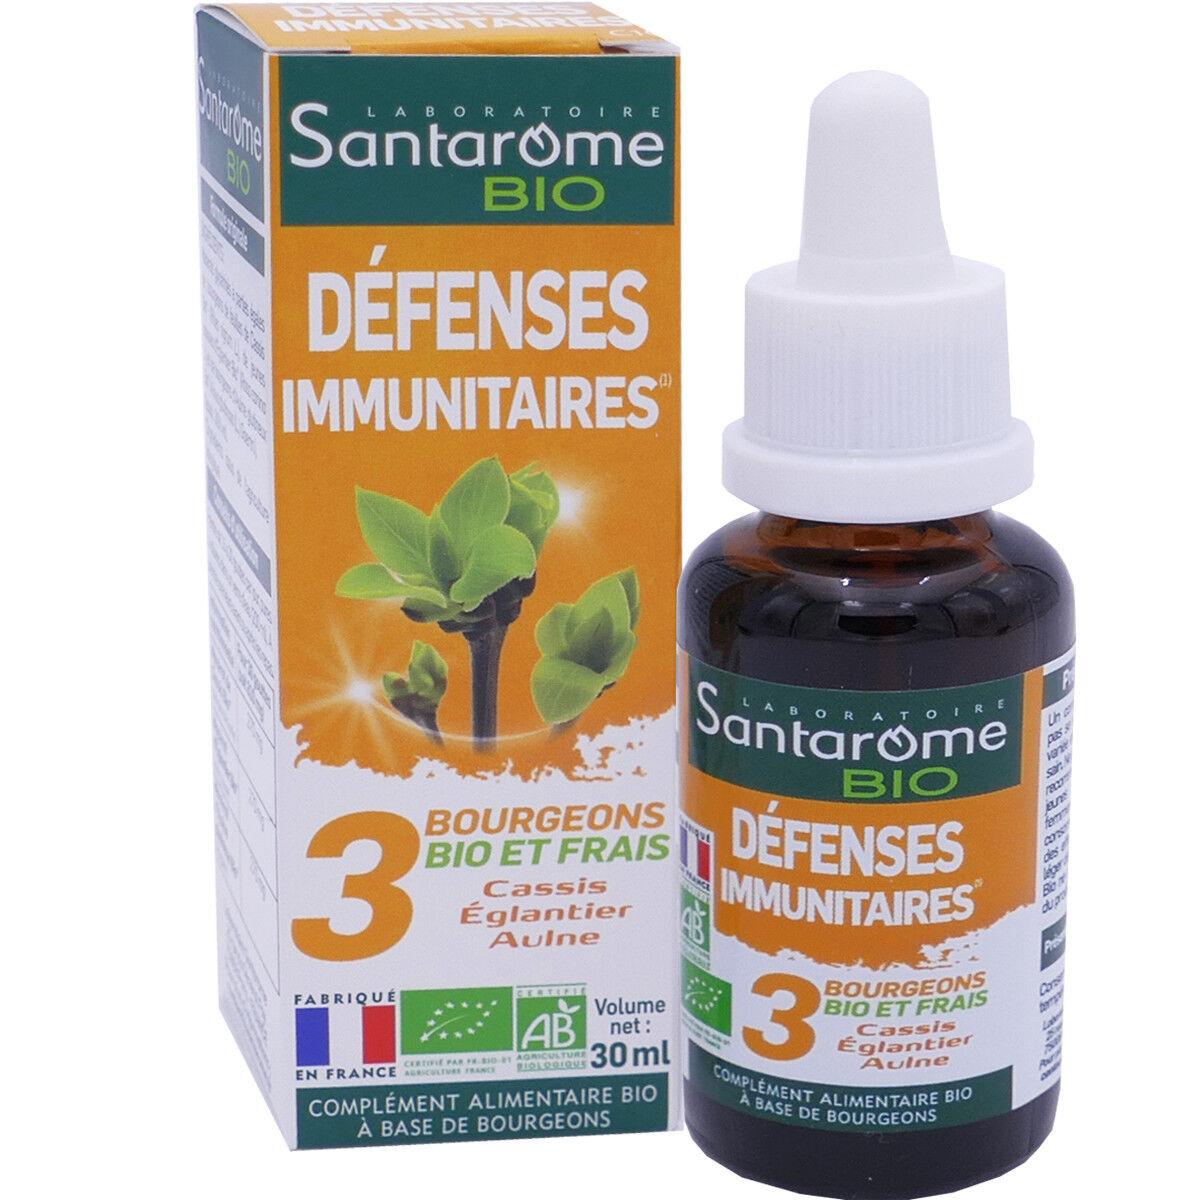 SANTAROME BIO Santarome defenses immunitaires 30 ml